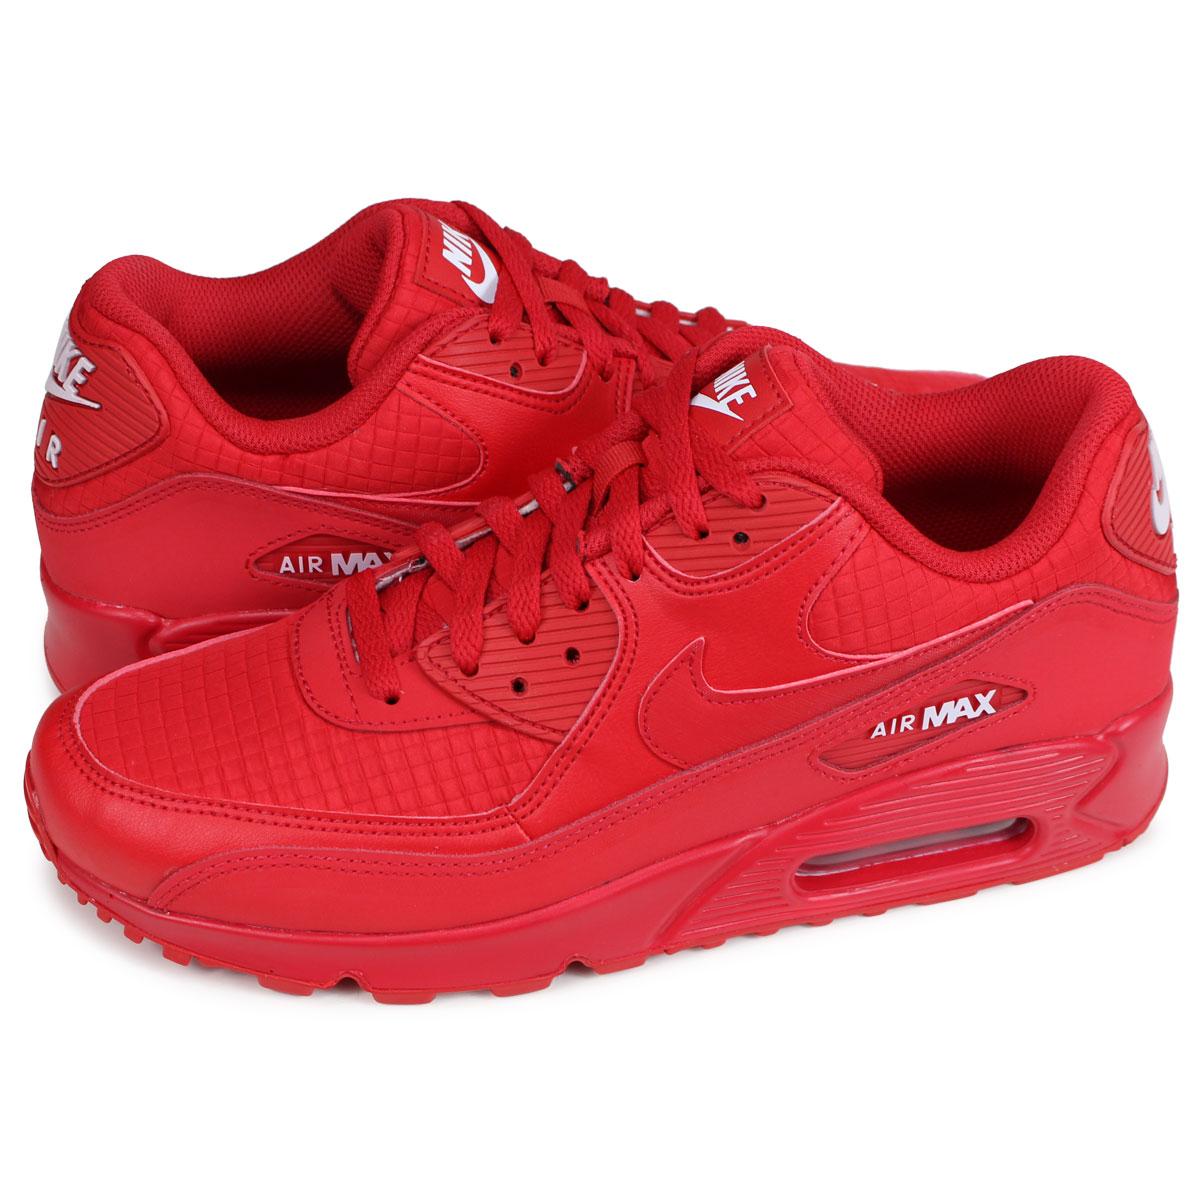 dbb7eebd20d73 Nike NIKE Air Max 90 essential sneakers men gap Dis AIR MAX 90 ESSENTIAL  red AJ1285-602  1 30 Shinnyu load